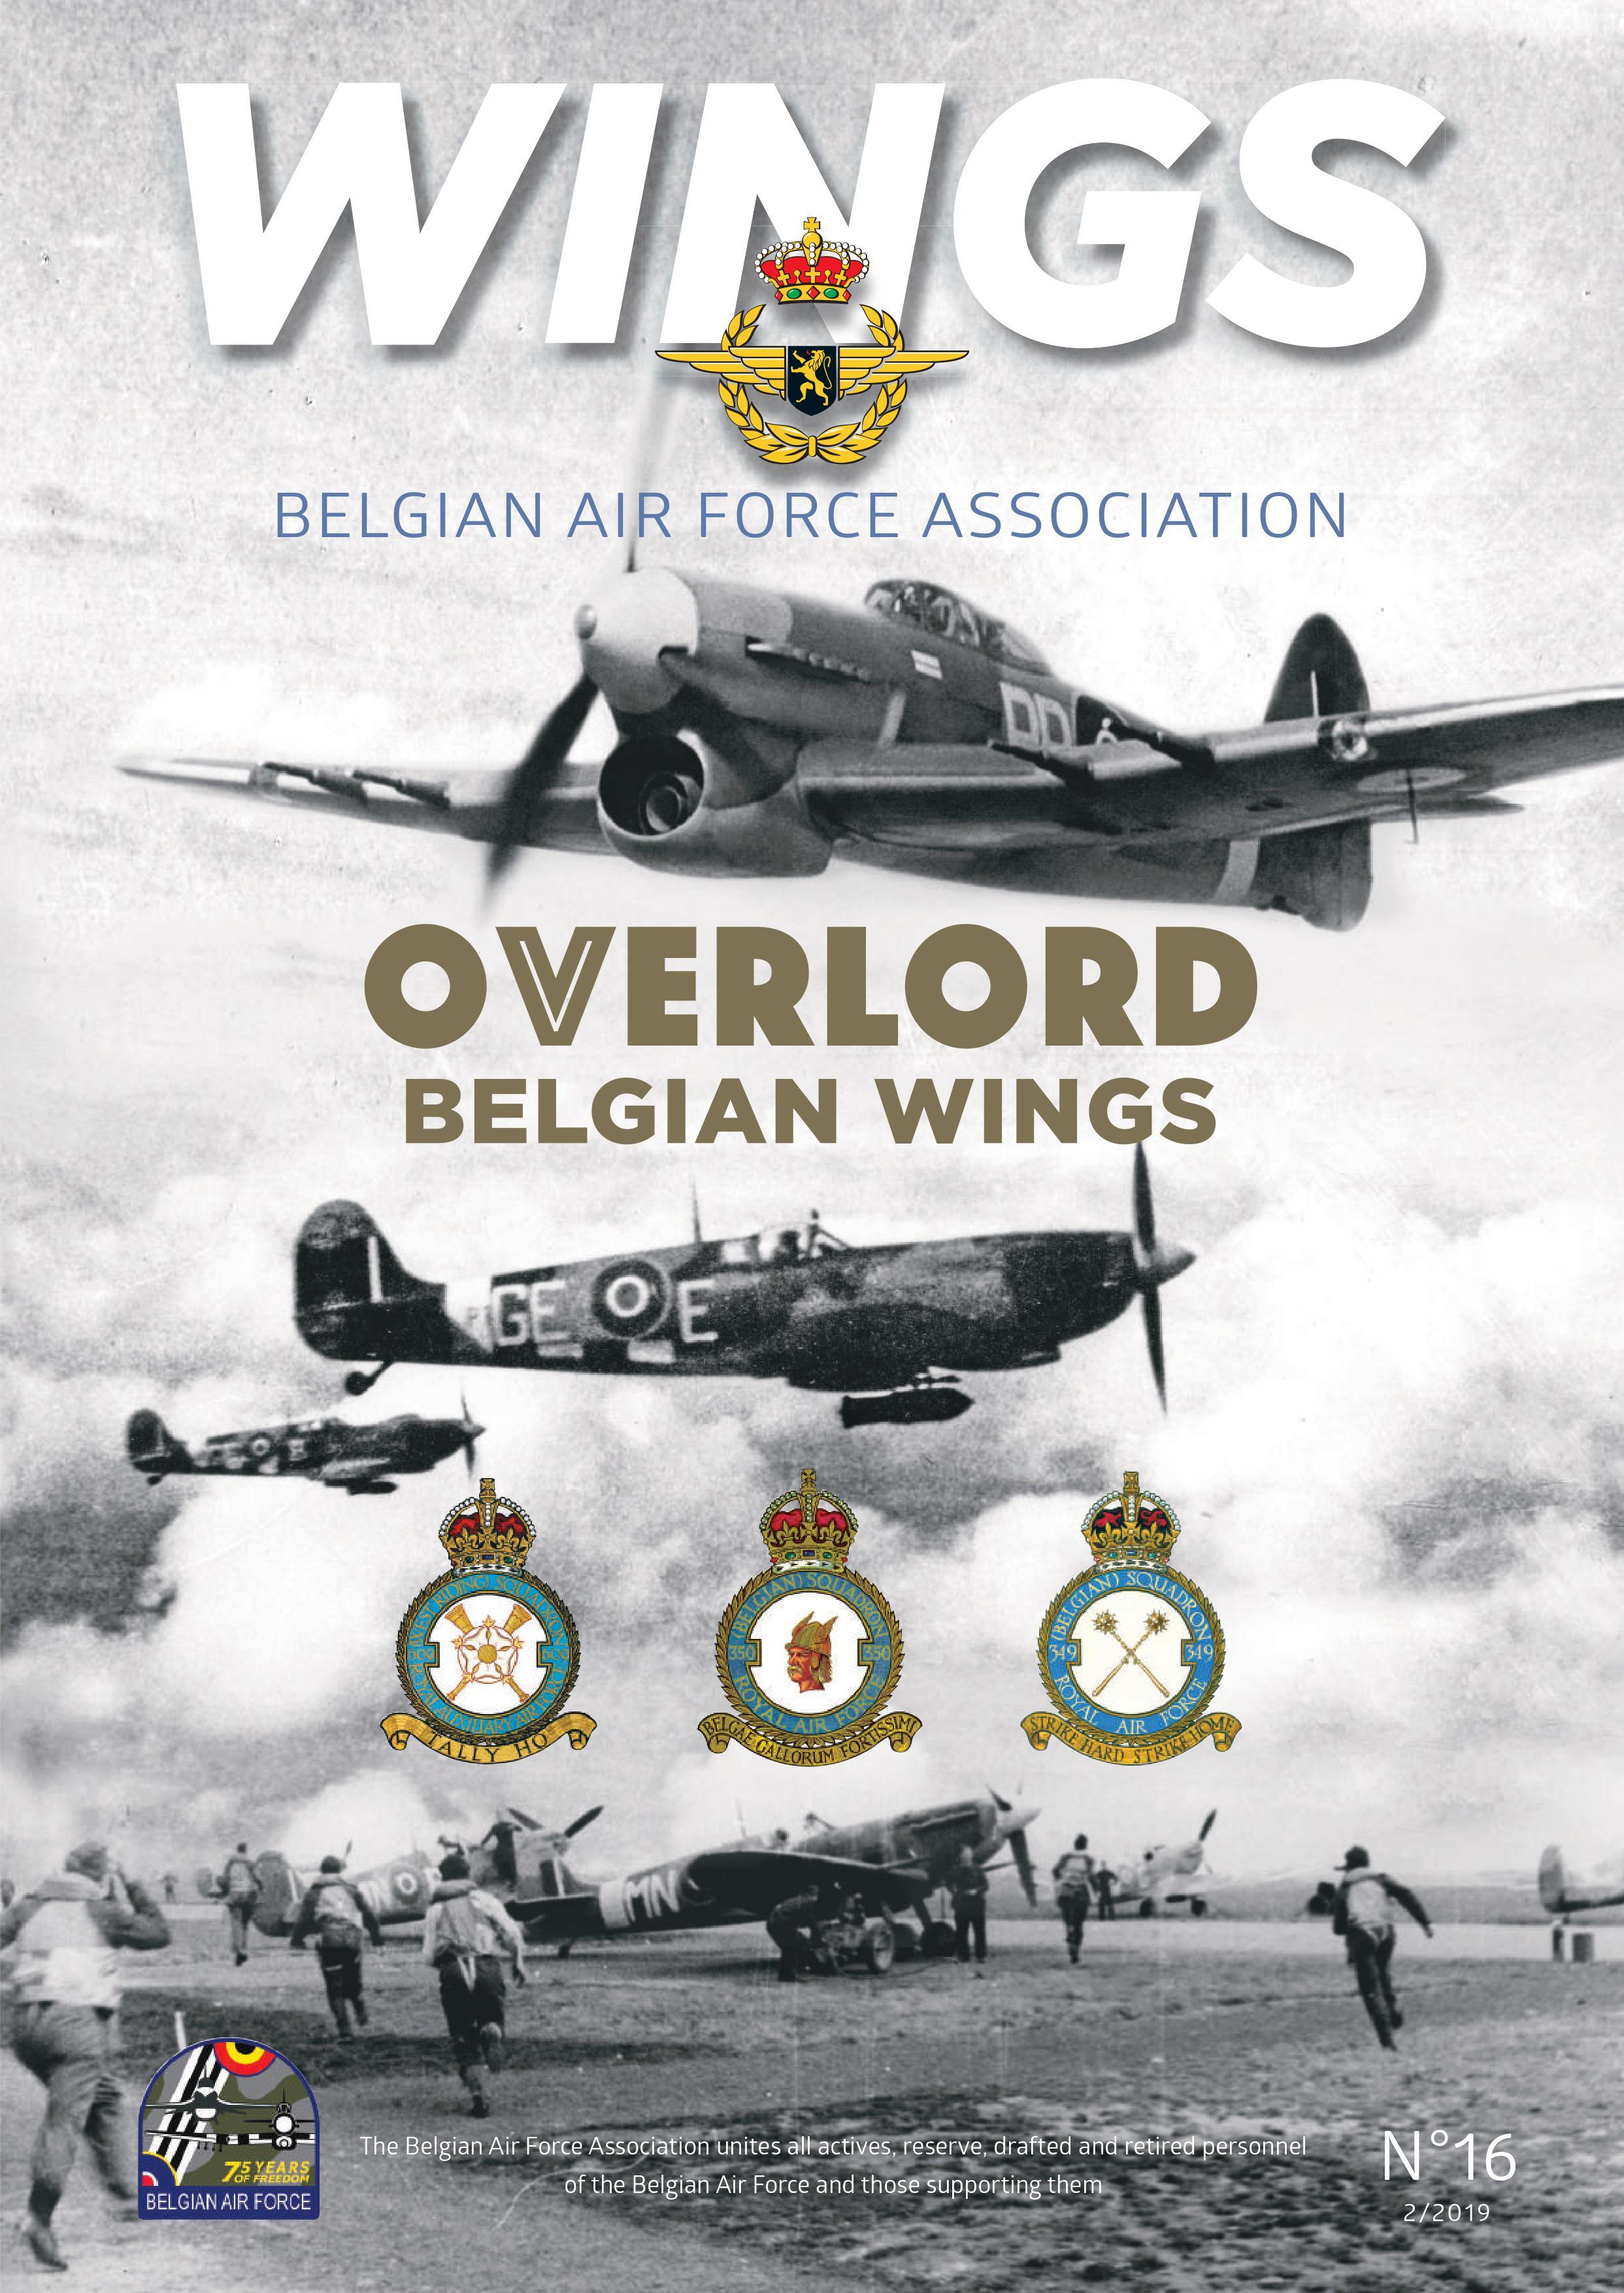 Wings 16 - Belgian Air Force Association